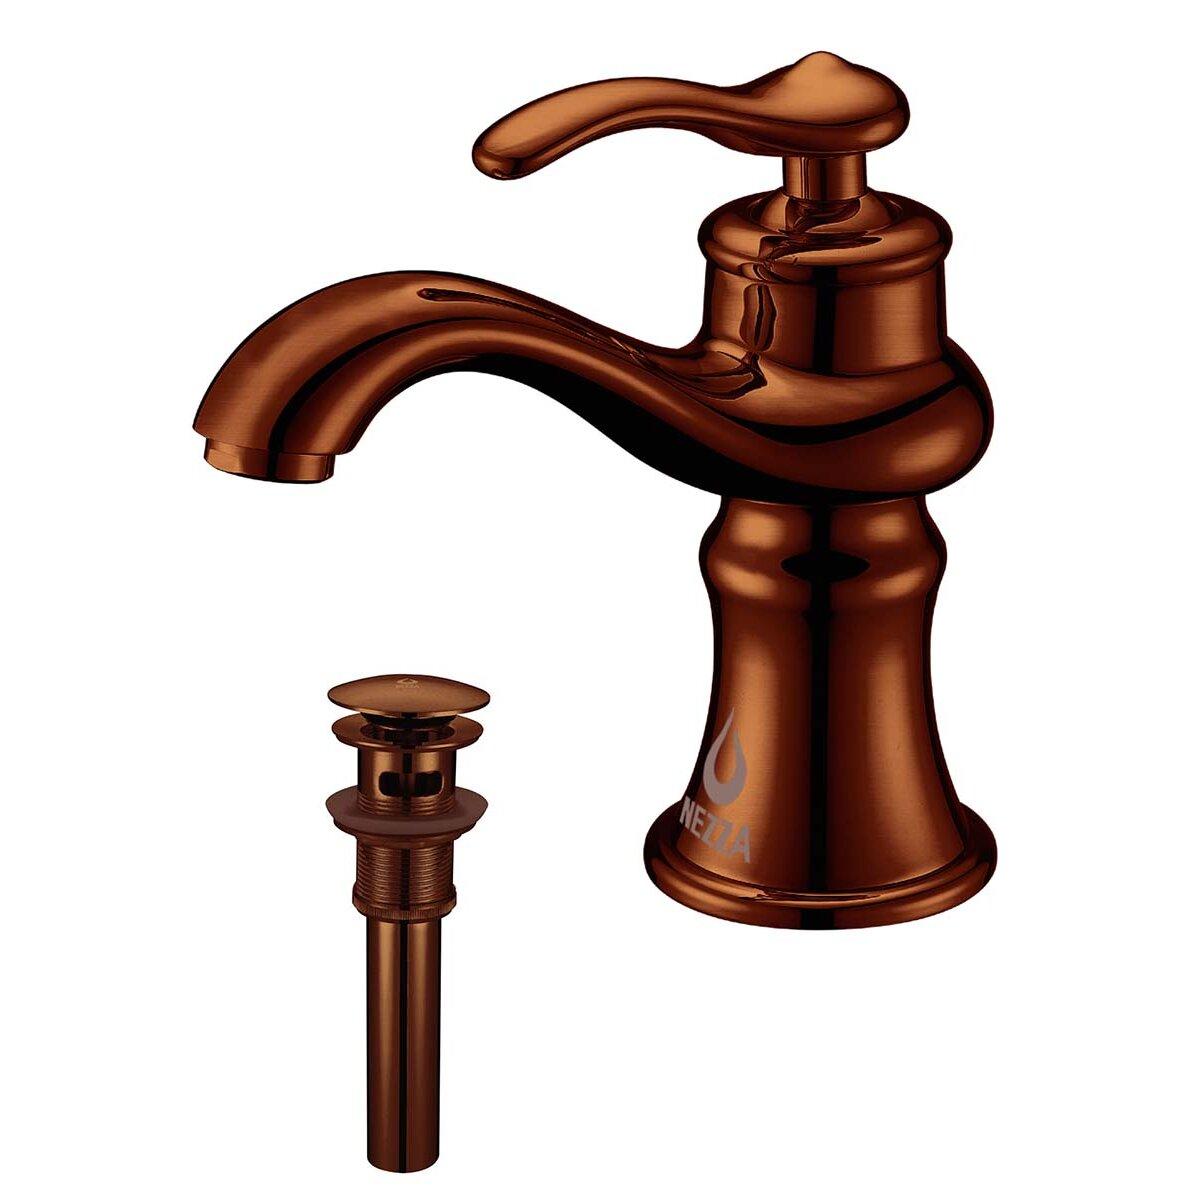 Brass Single Handle Bathroom Faucet : Mamba Single Handle Bathroom Sink Brass Faucet with Drain Assembly by ...